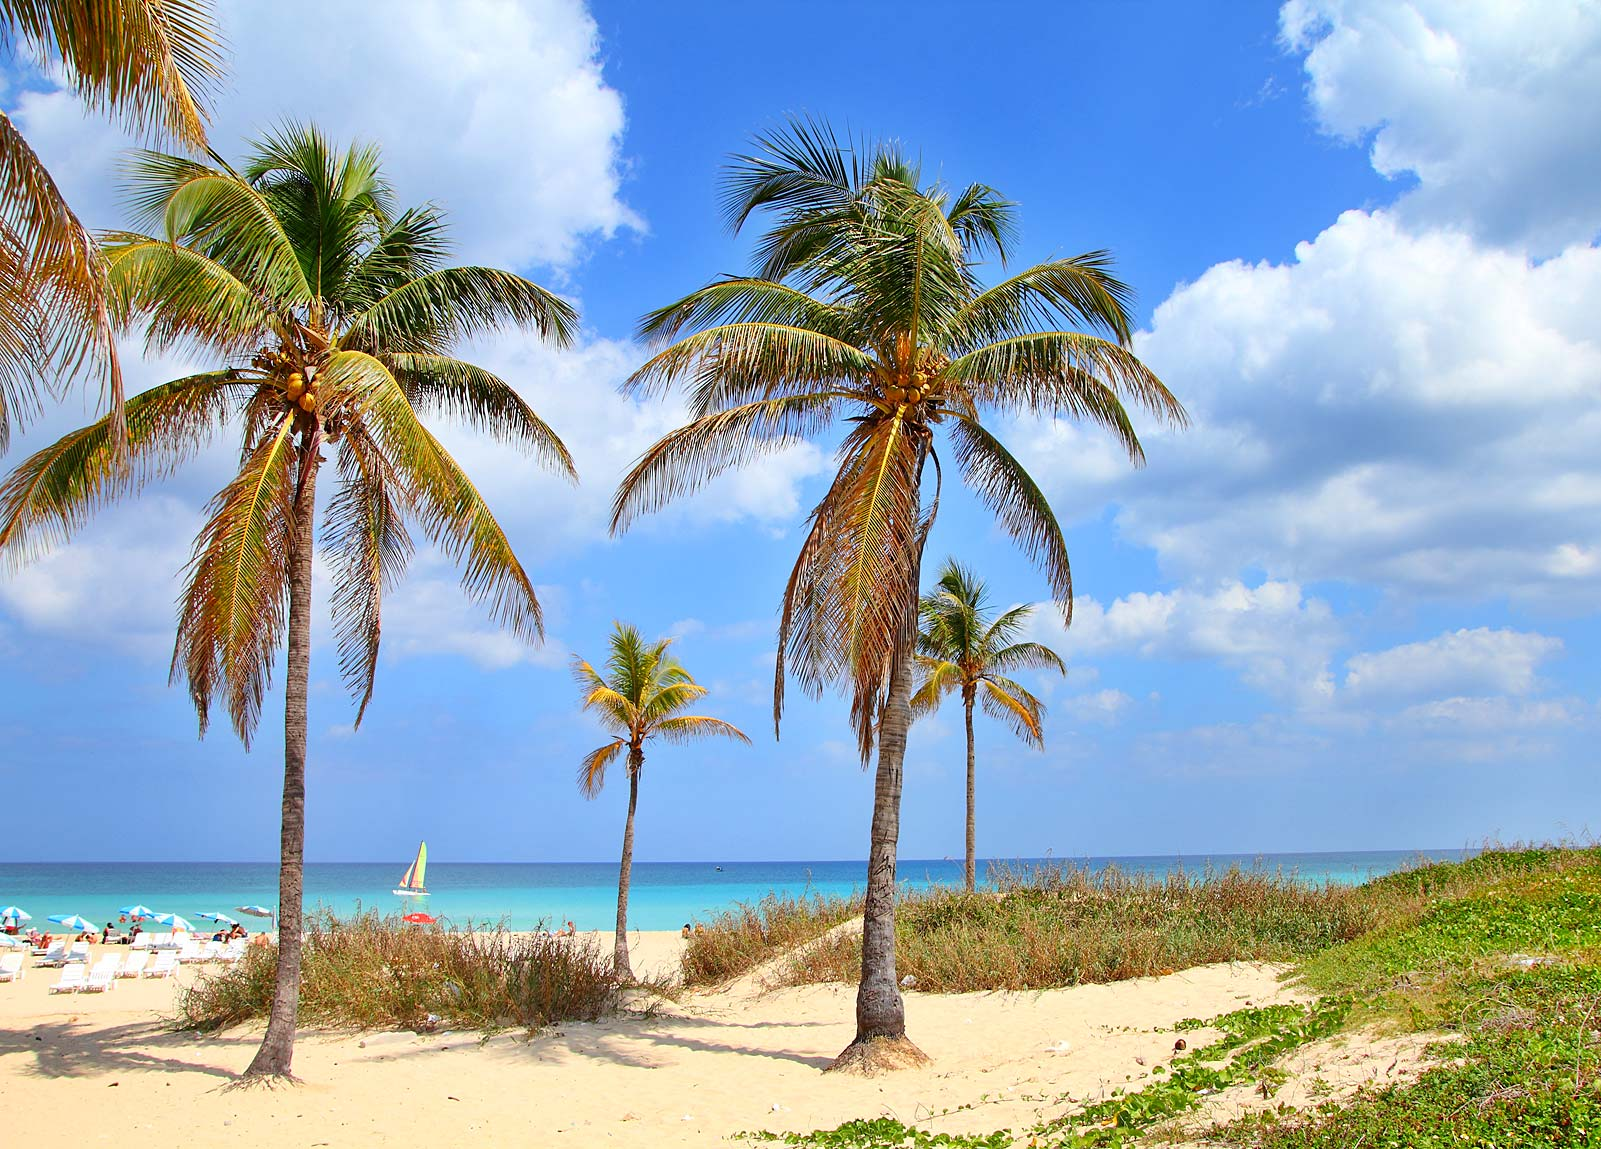 Playa Megano Popular Beach On Cayo Ensenachos